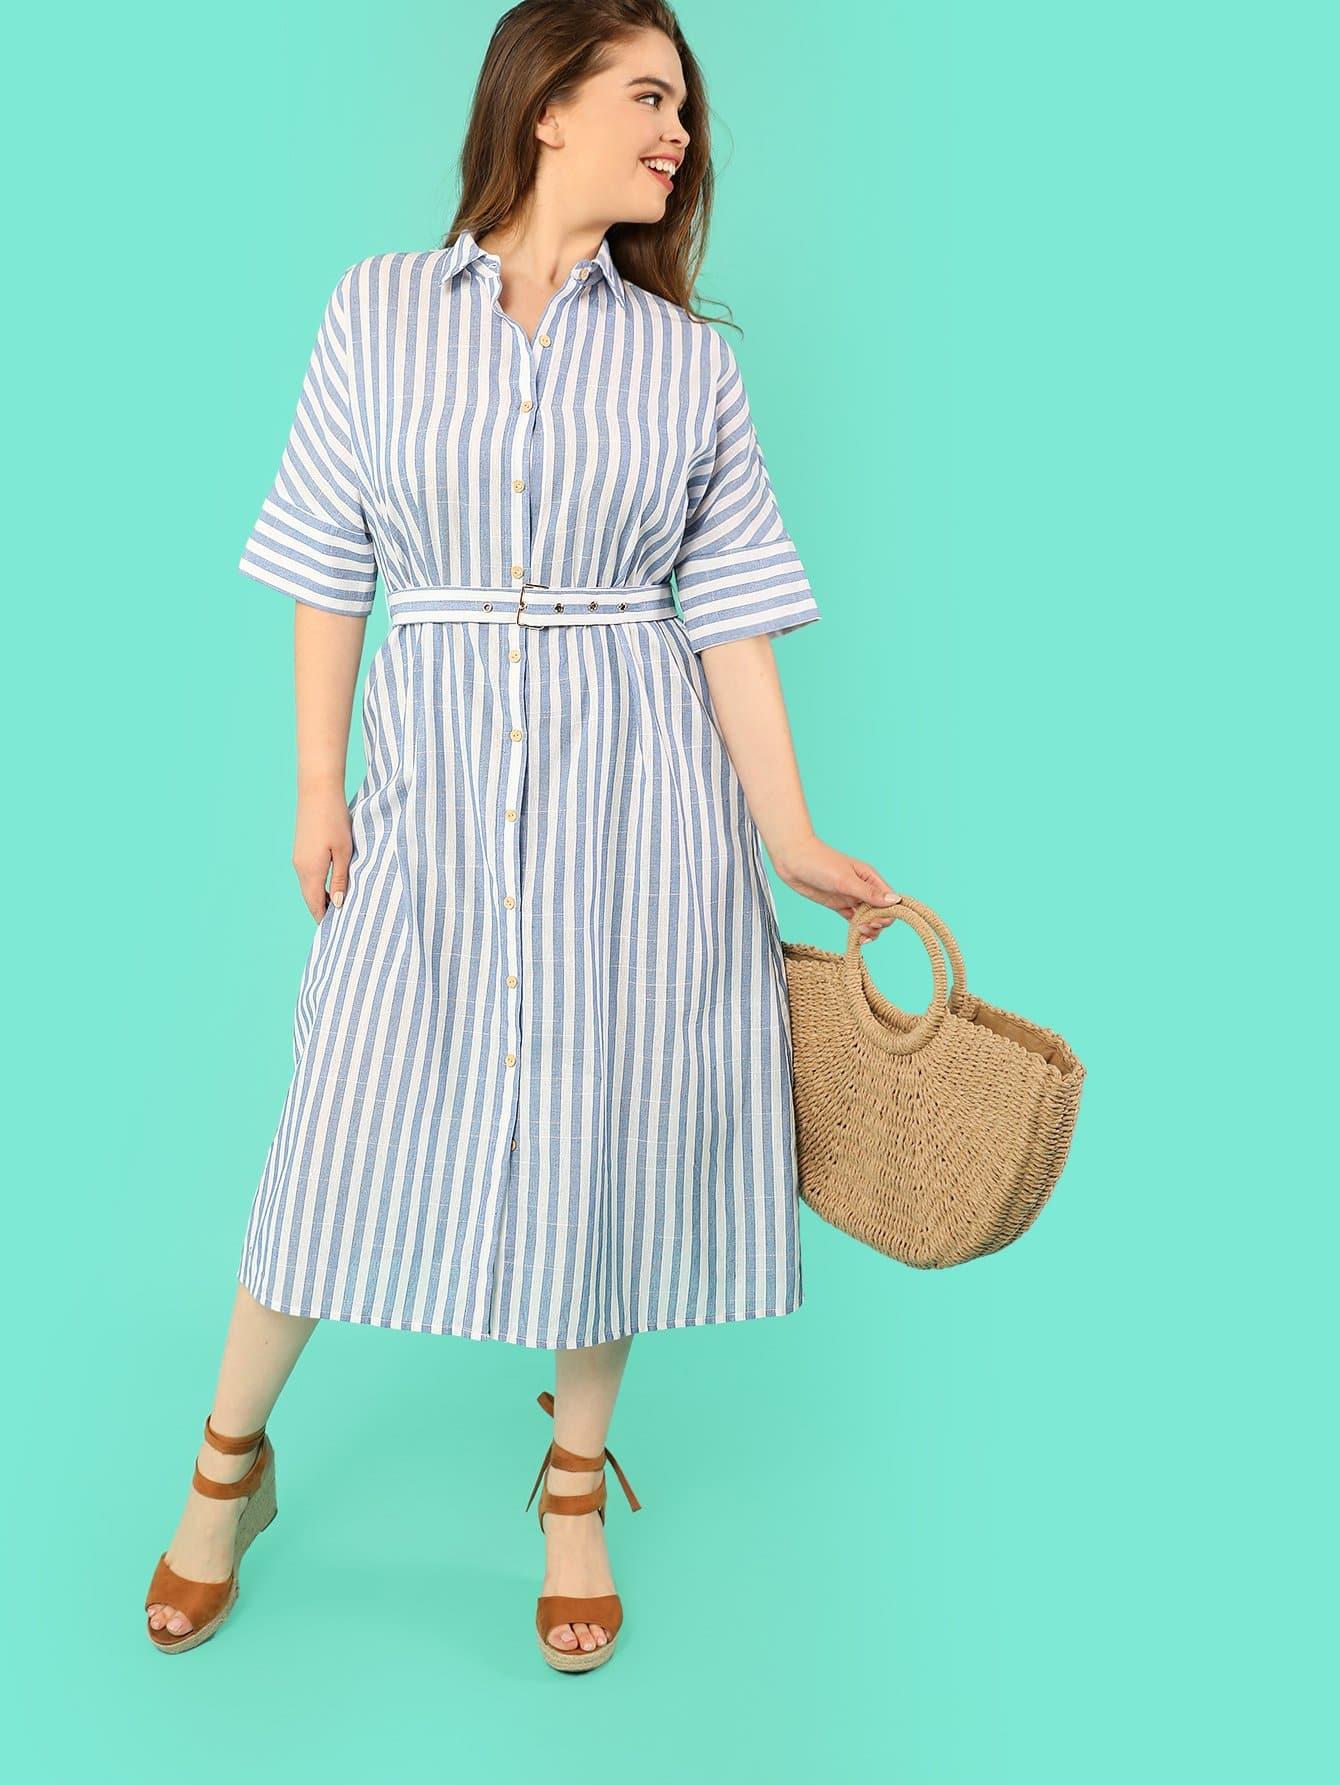 Batwing Sleeve Pinstripe Shirt Dress batwing sleeve pinstripe shirt dress